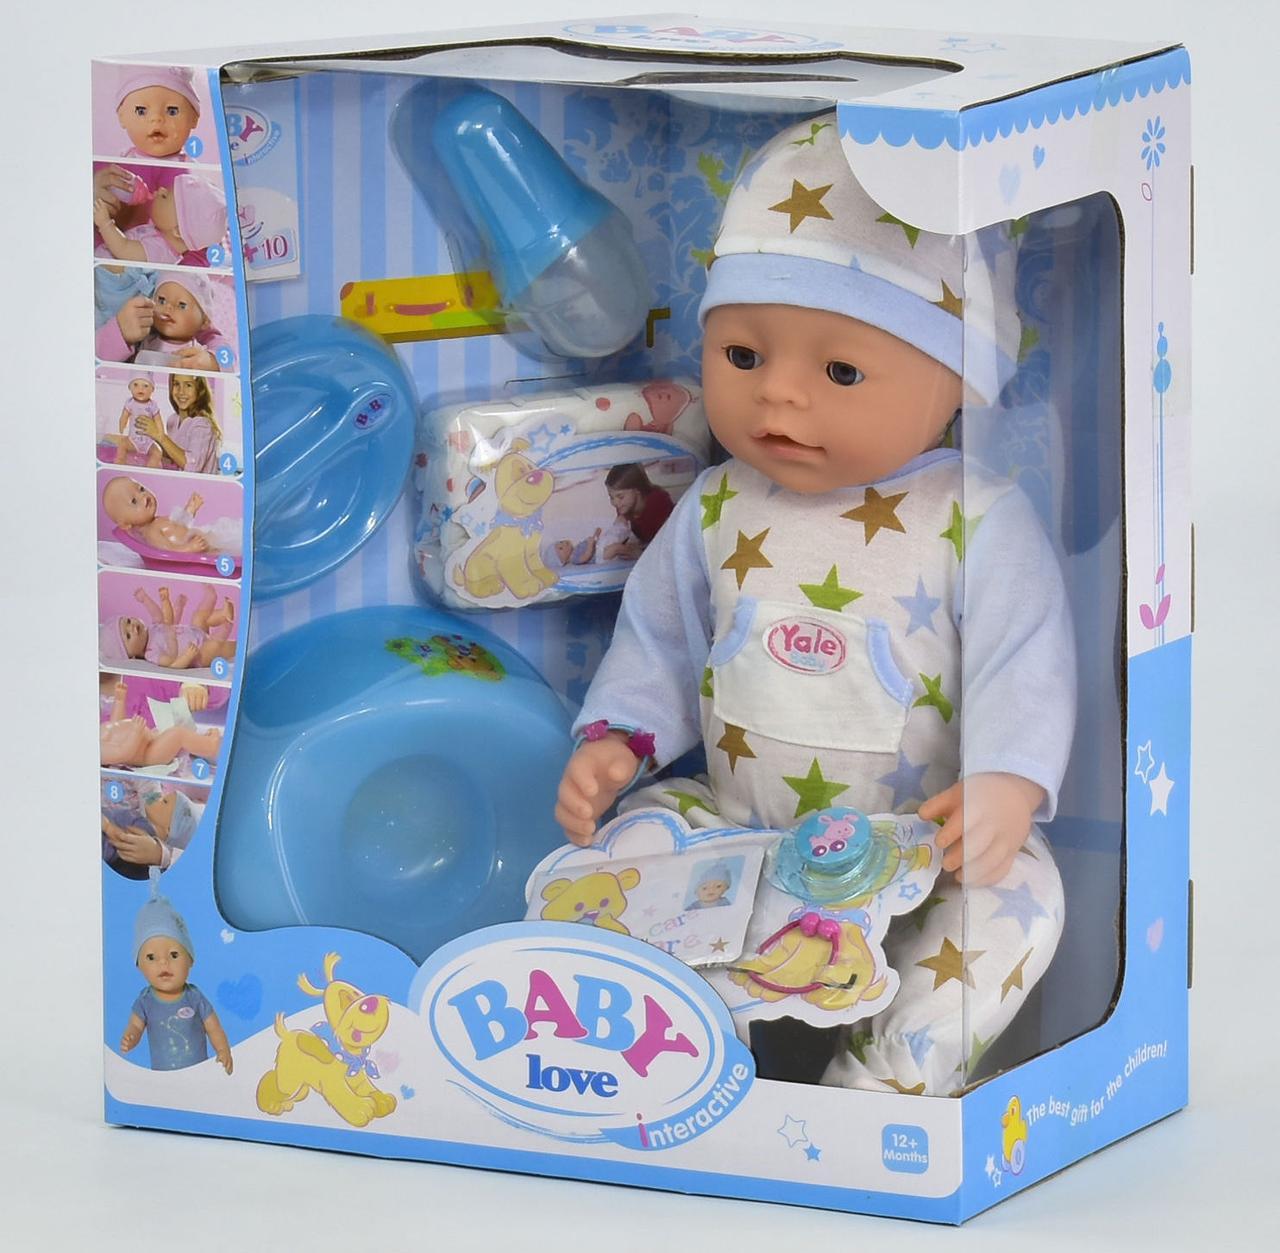 Пупс Baby Love  033 B (12) с аксессуарами, в коробке